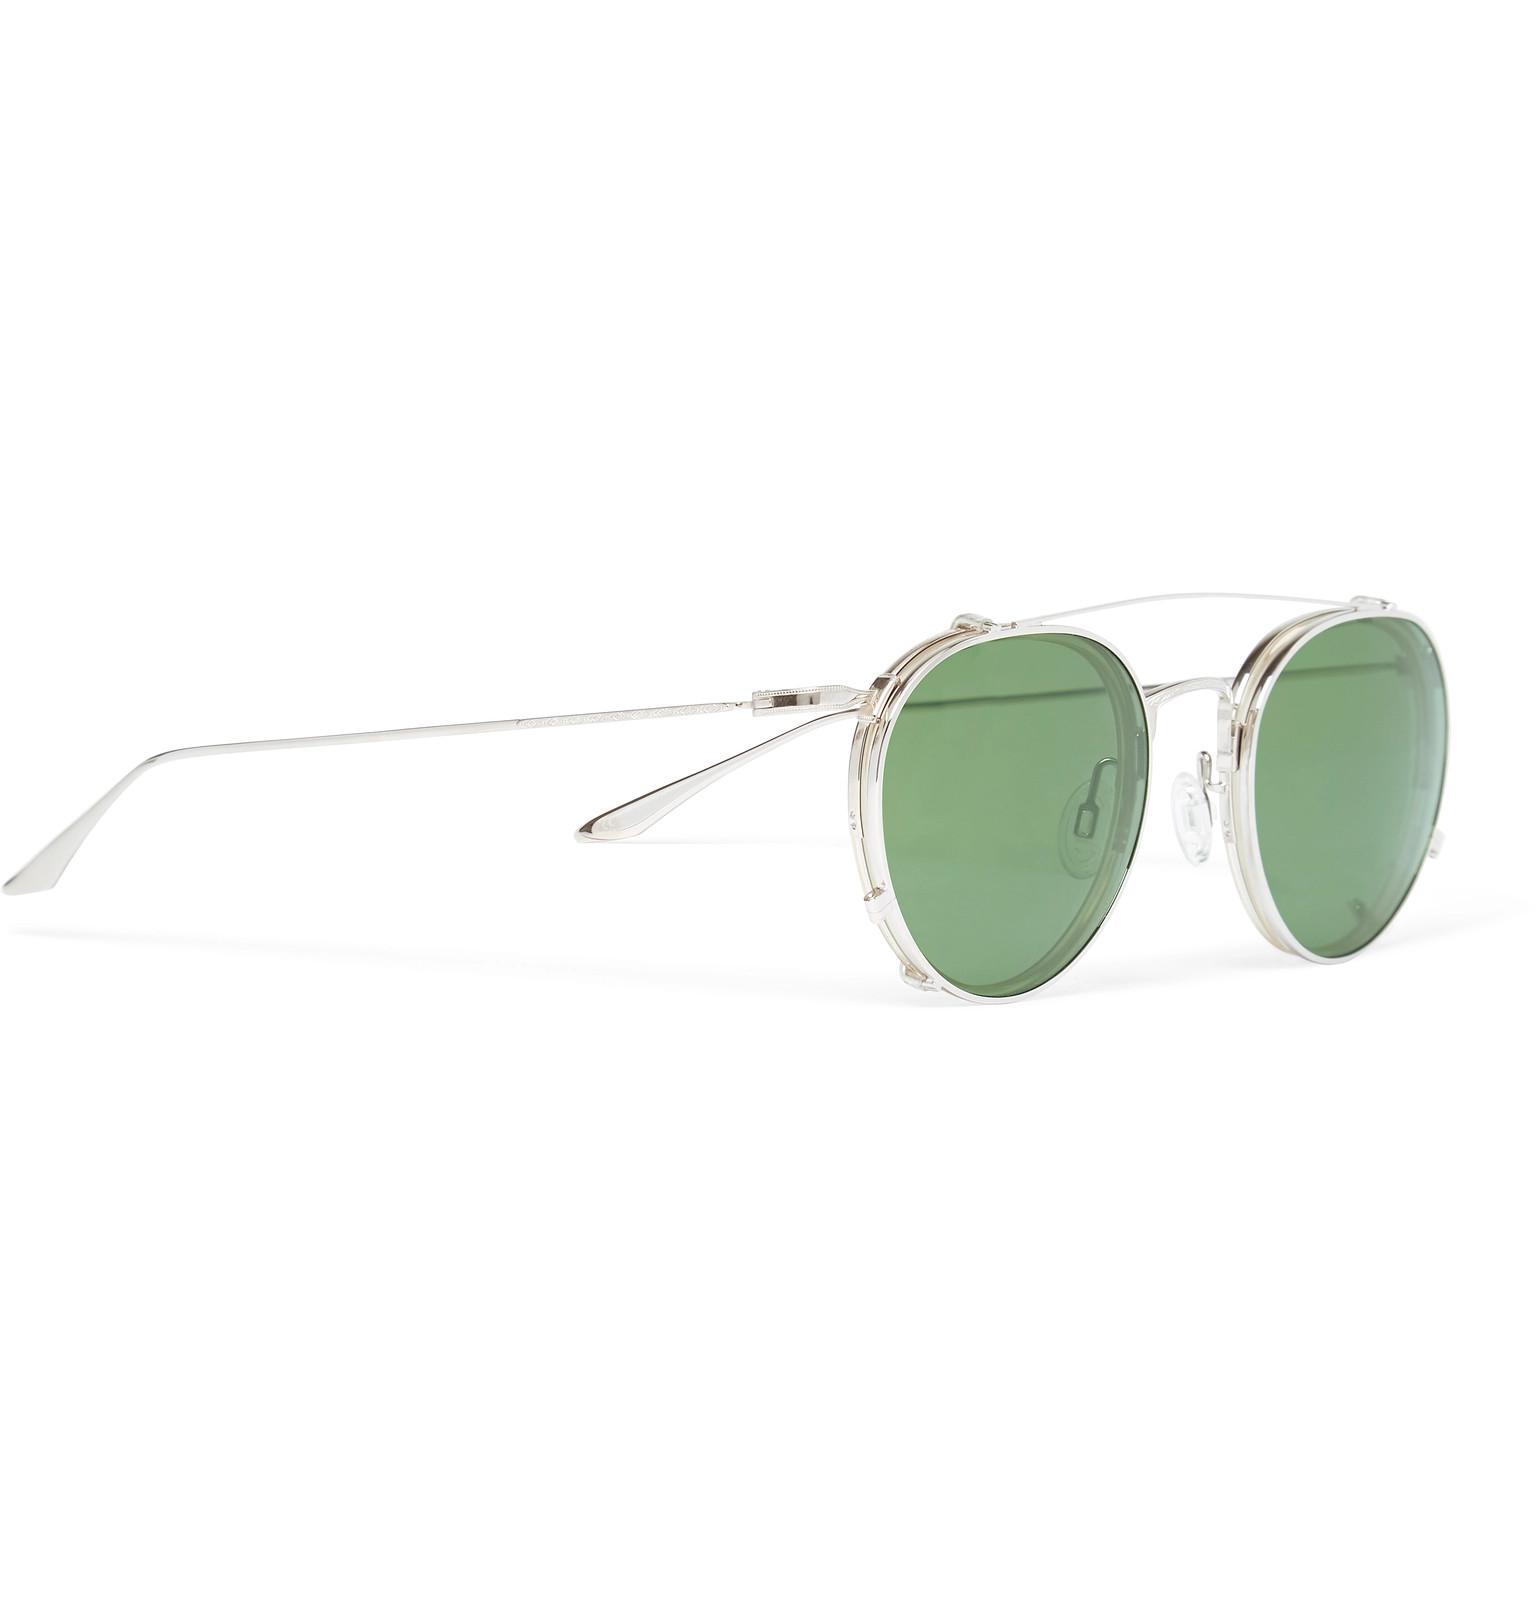 155d6d8aca Barton Perreira - Metallic Aalto Round-frame Titanium And Acetate Optical  Glasses With Clip-. View fullscreen